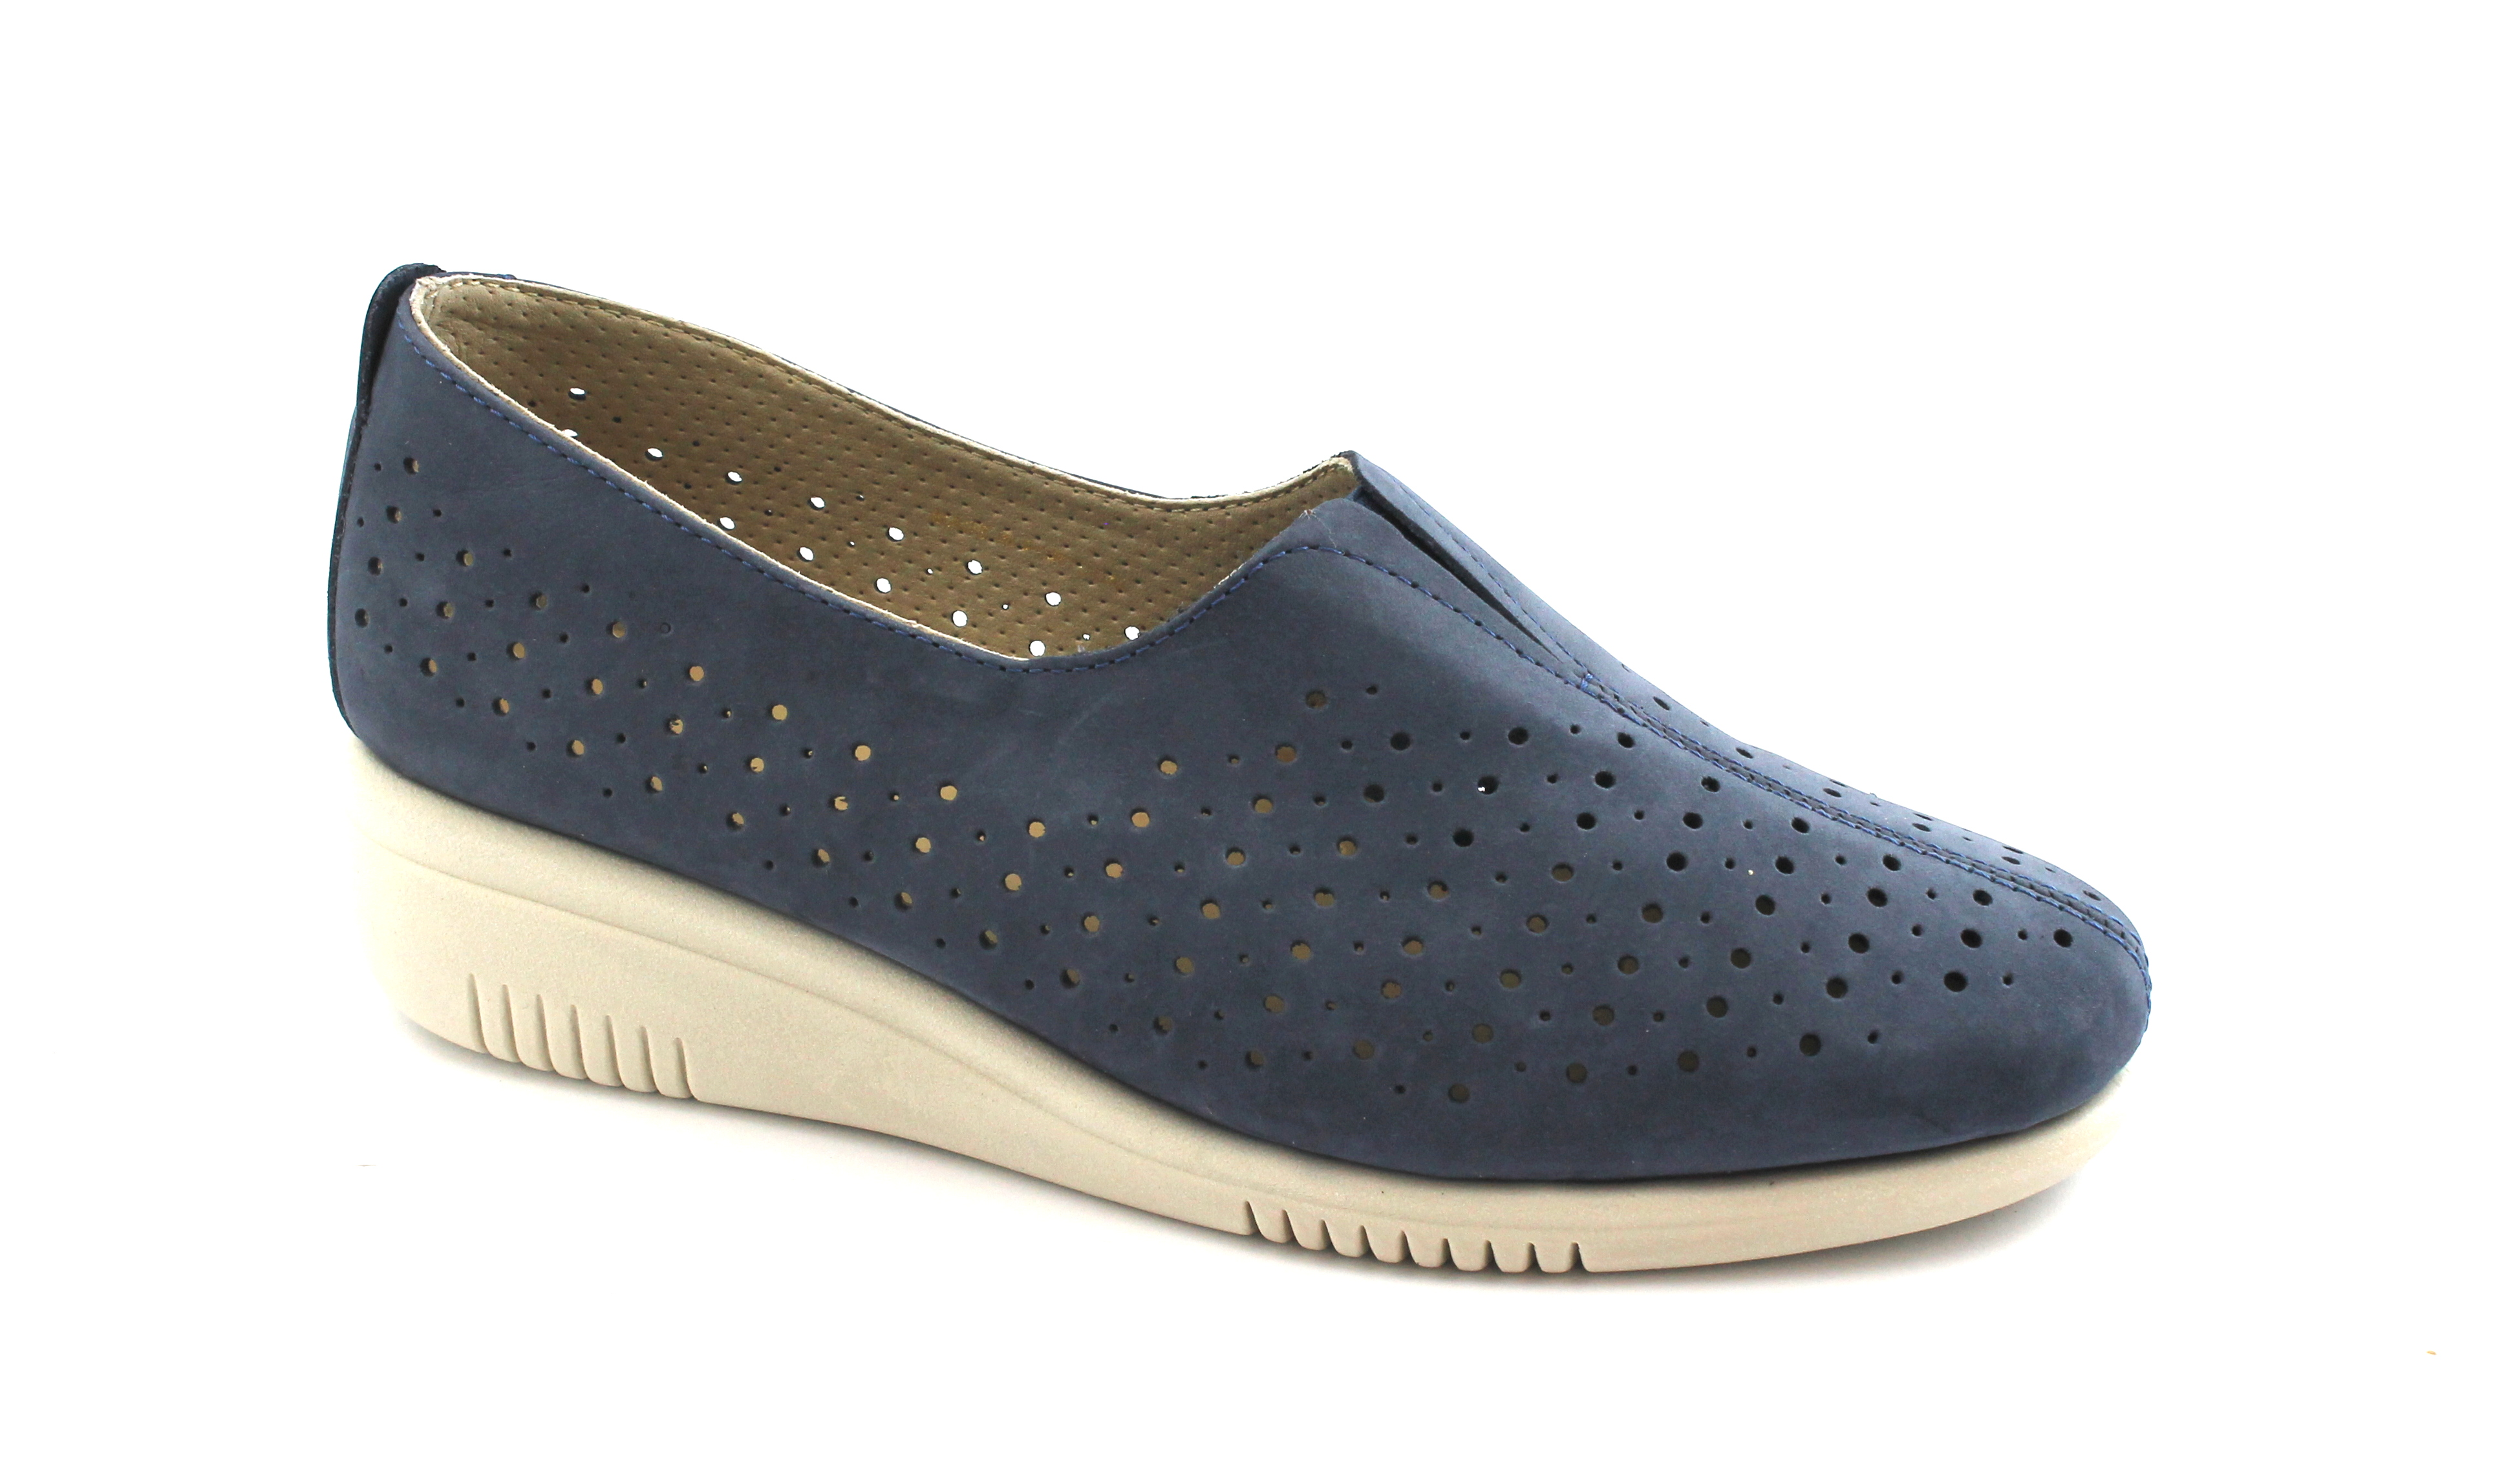 Zapatos de mujer baratos zapatos de mujer Descuento por tiempo limitado GRUNLAND SIRA SC3763 blu scarpe donna zeppetta elastico forata